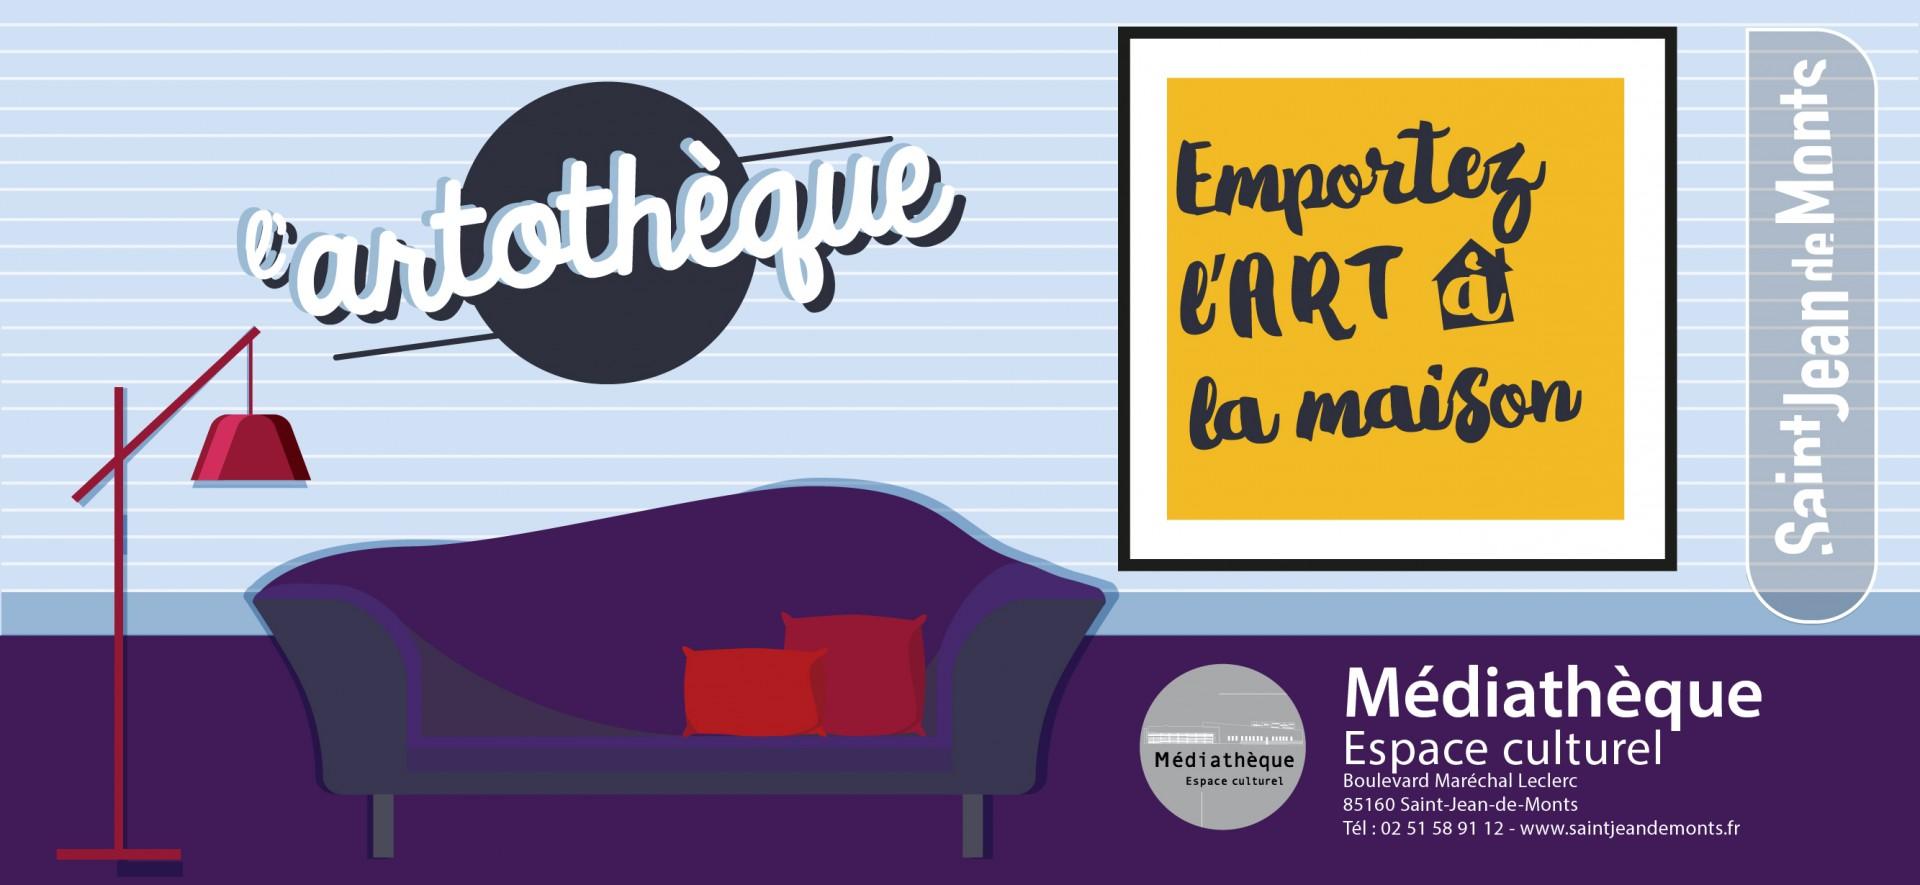 artotheque-site-web-sjdm-plan-de-travail-1-7620